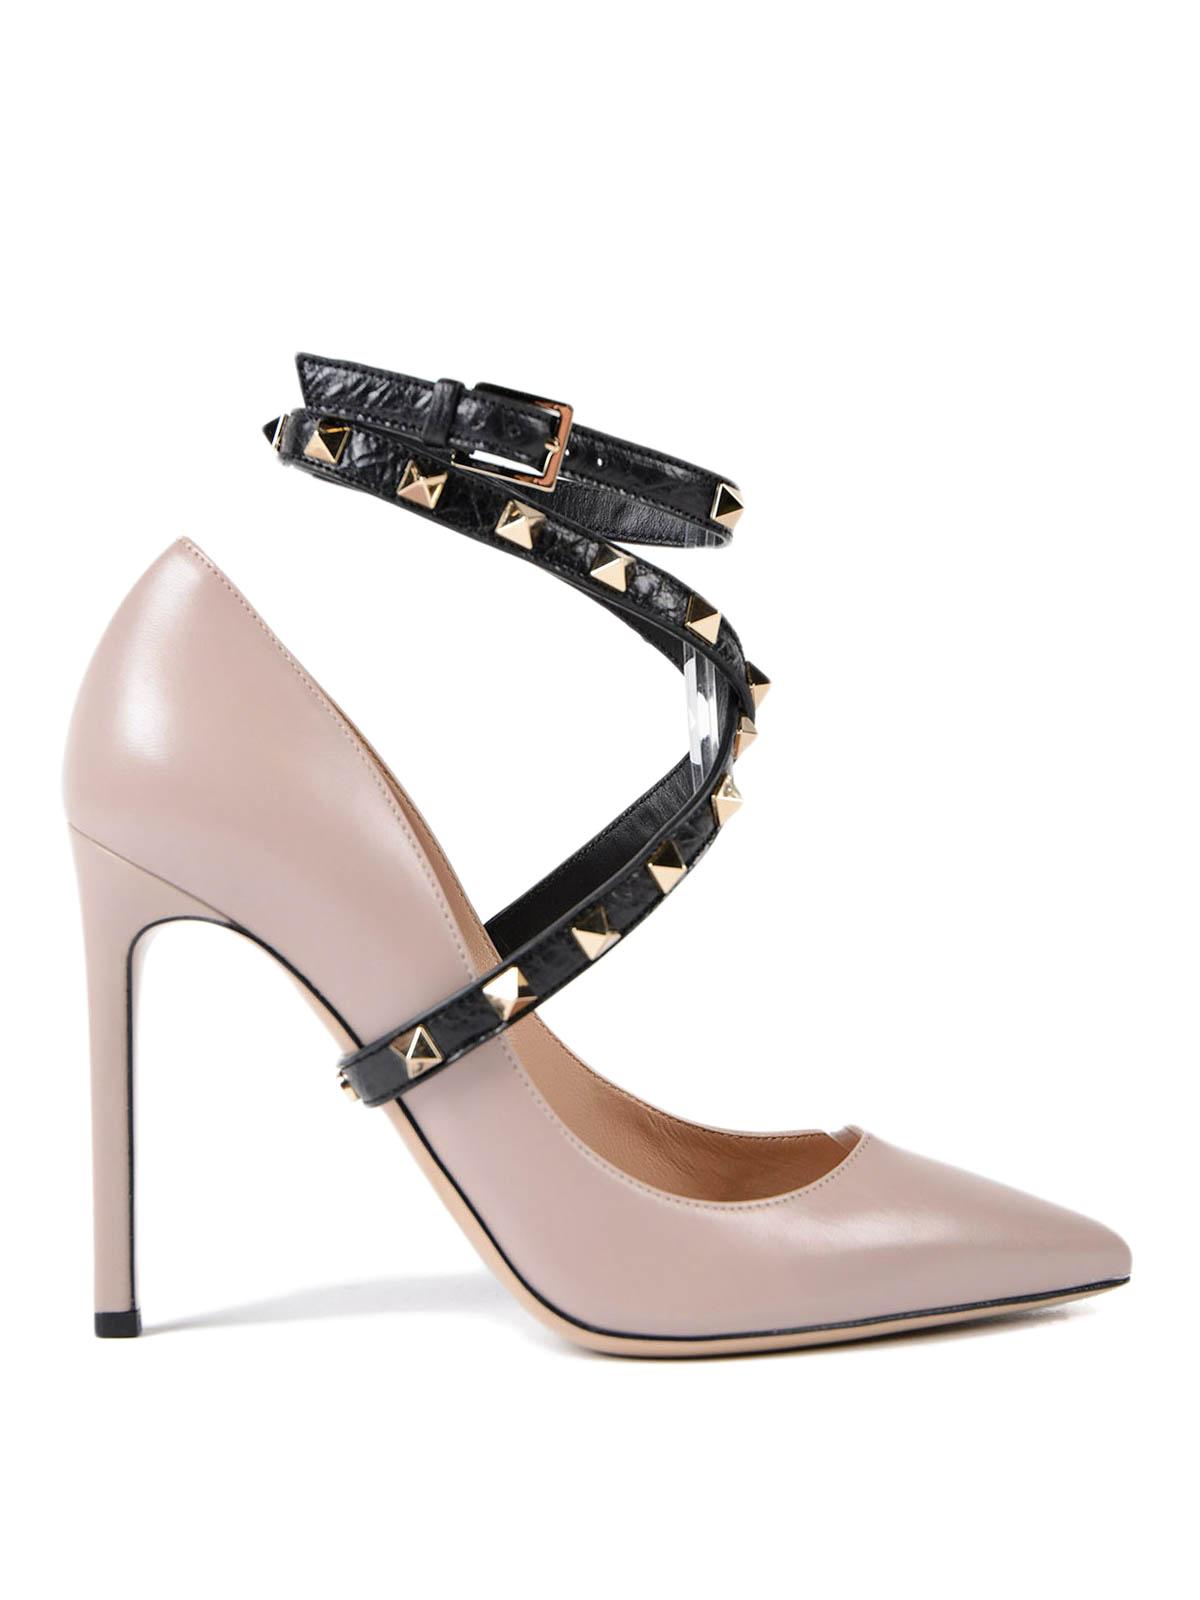 Rockstud ankle strap pumps